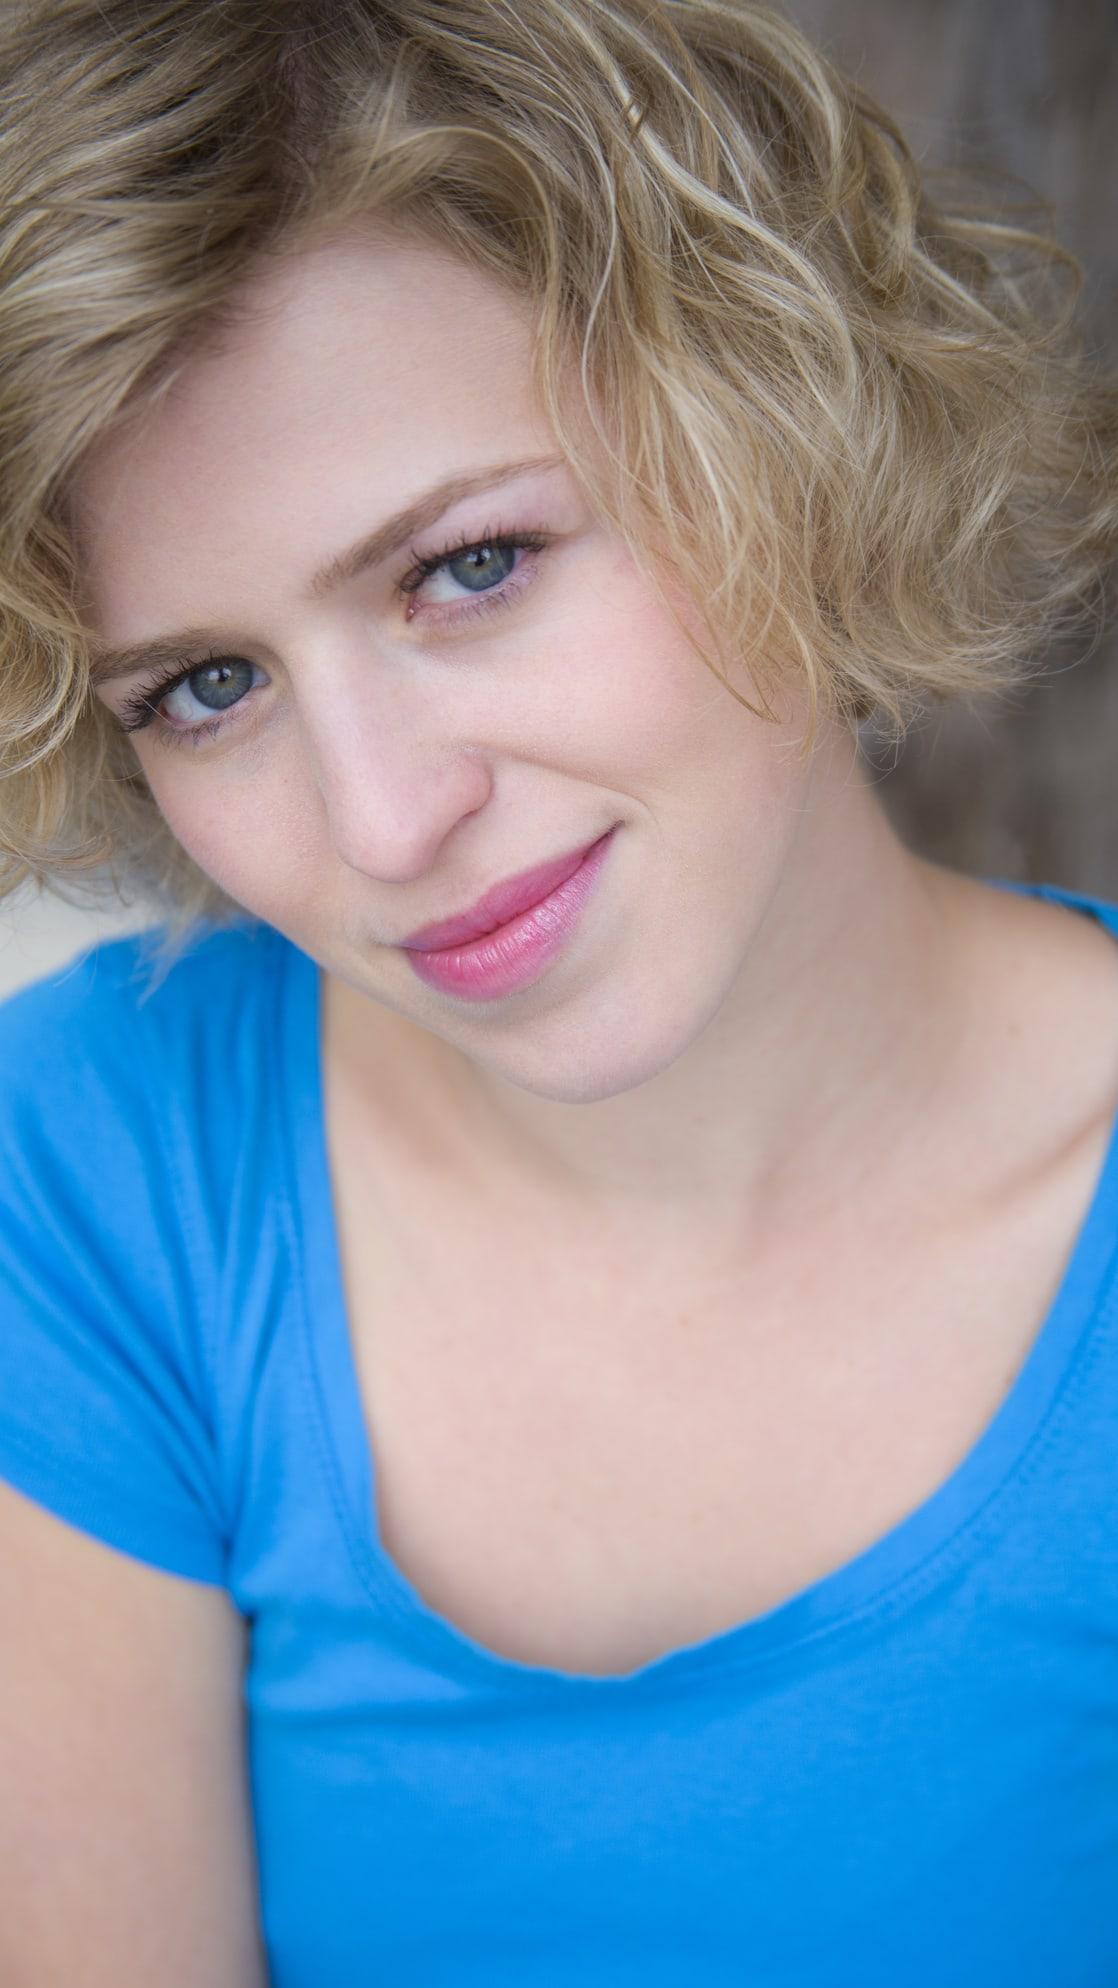 Chloe Berman